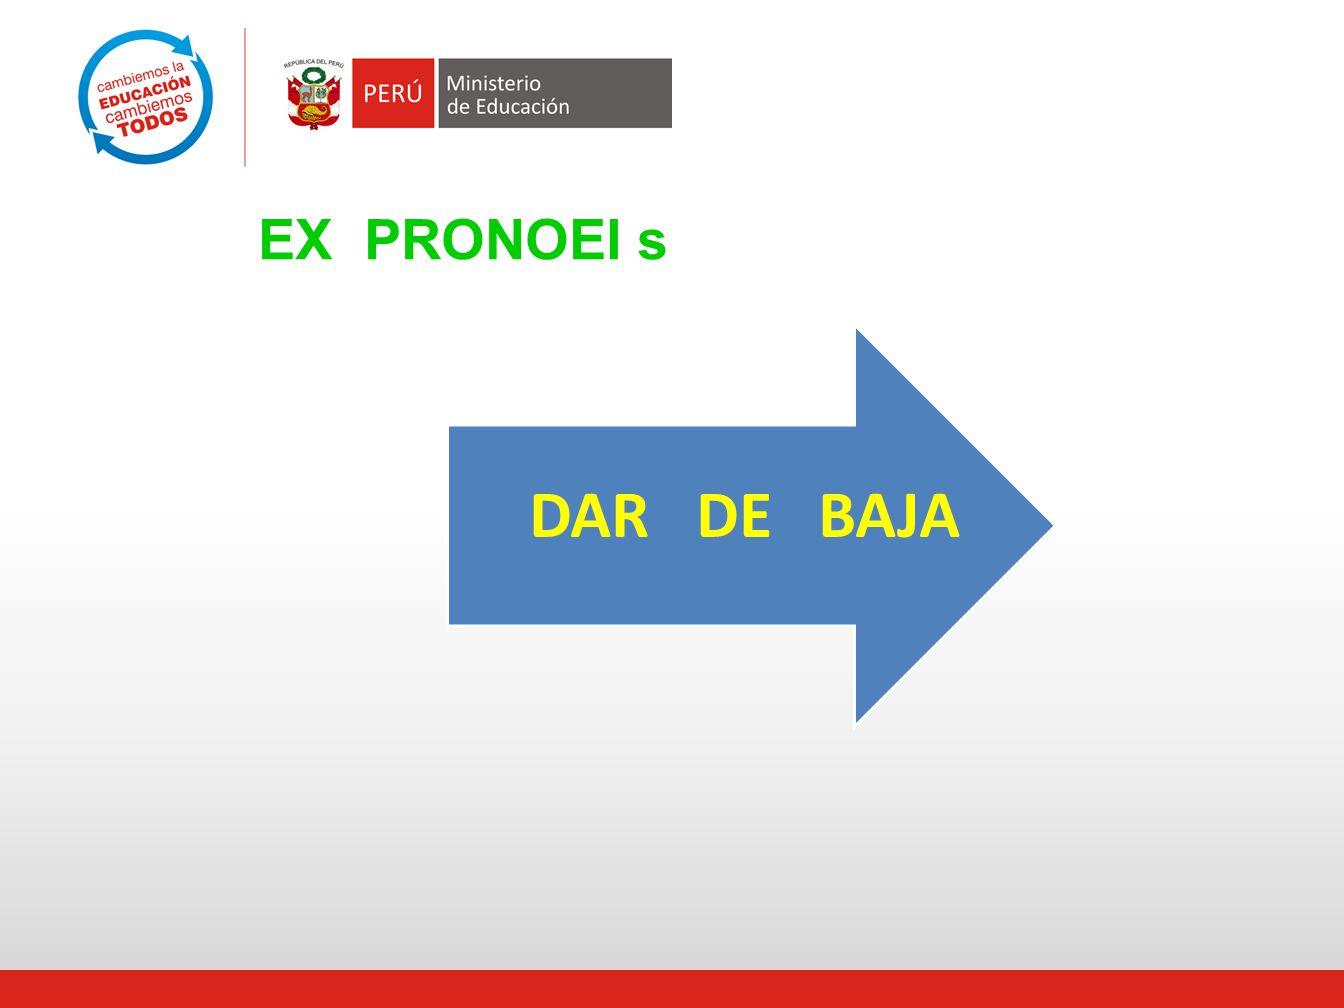 EX PRONOEI s DAR DE BAJA